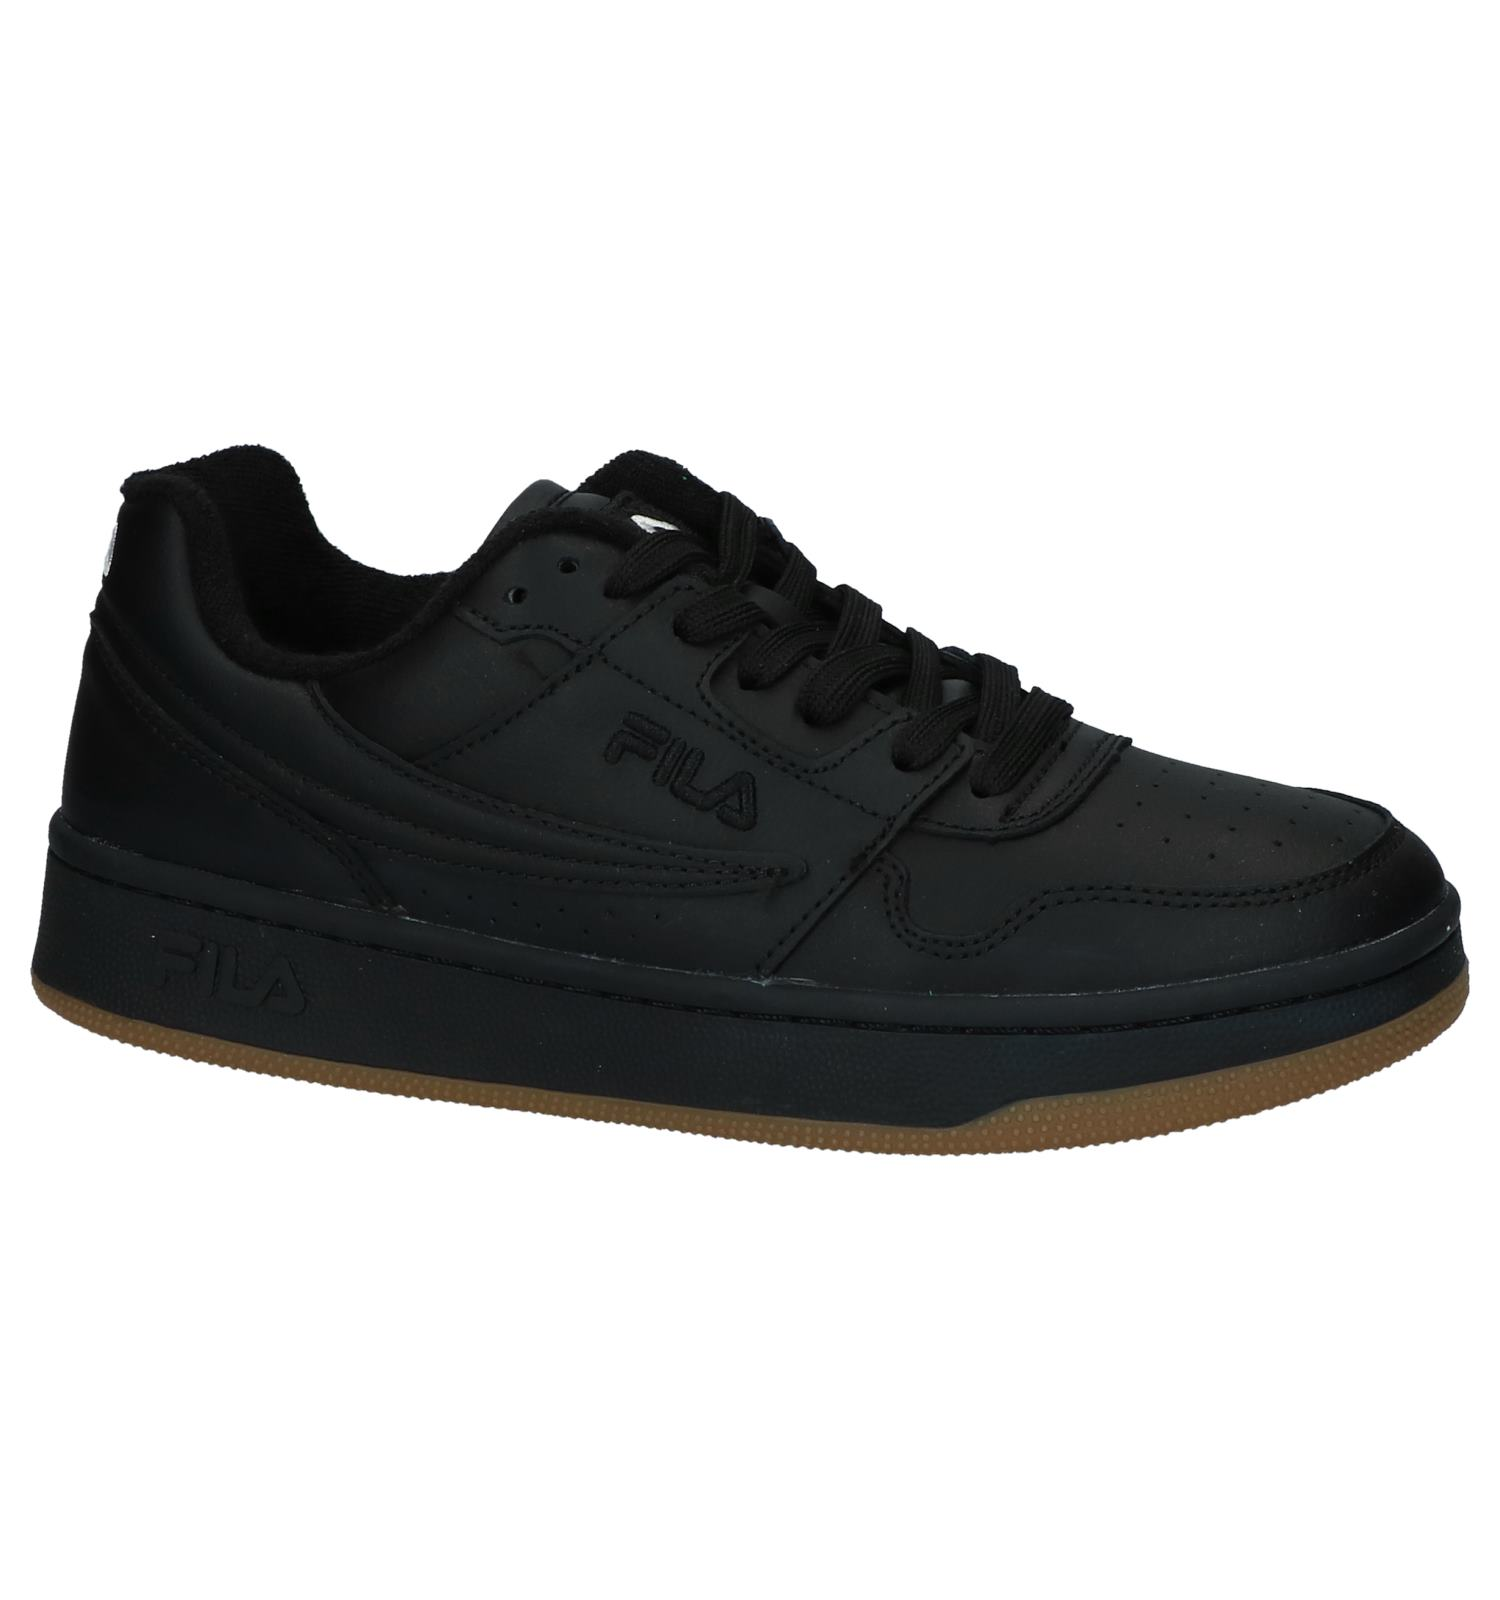 cef083fd8e2 Fila Arcade Low Zwarte Sneakers   TORFS.BE   Gratis verzend en retour